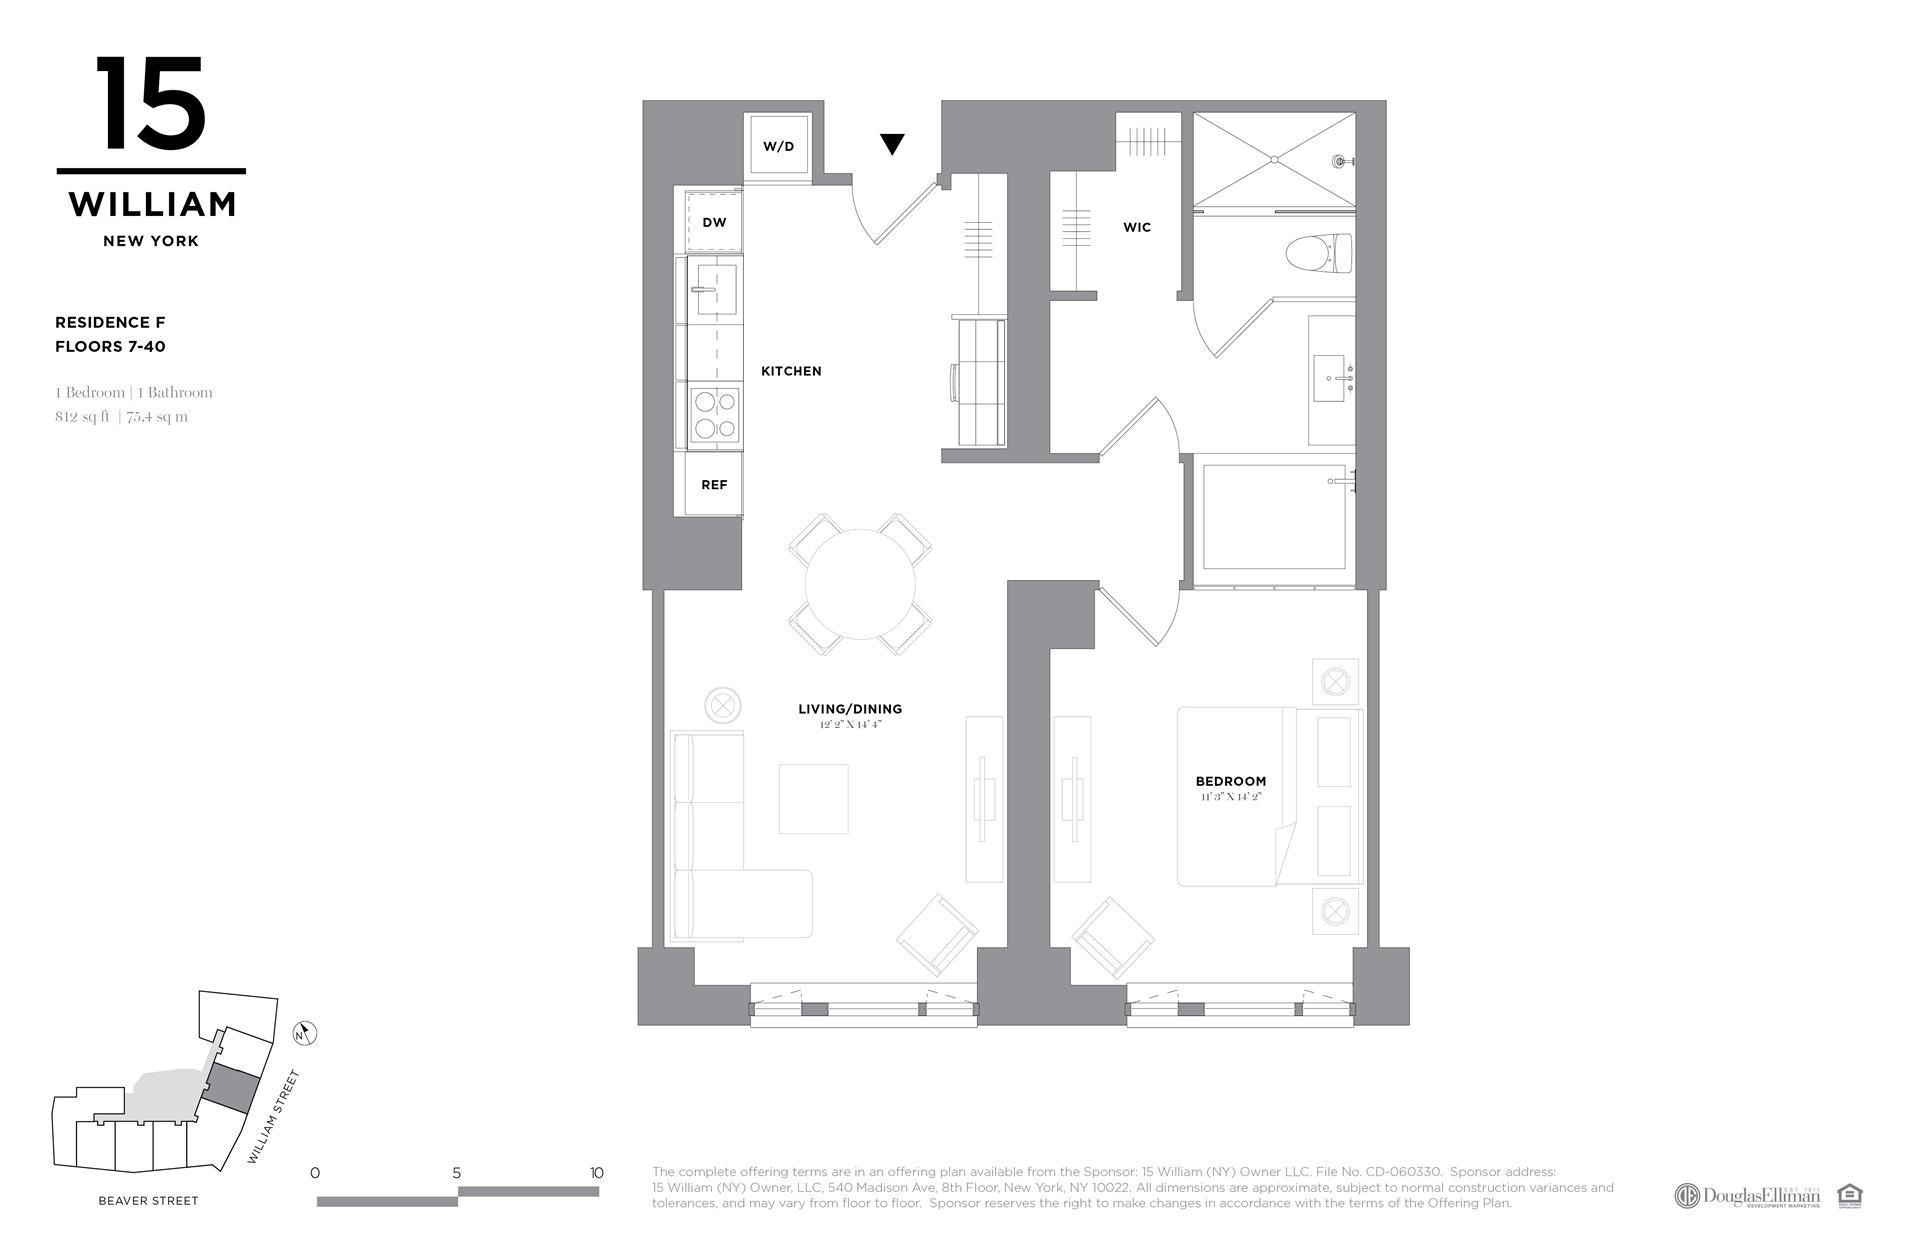 Floor plan of 15 William, 15 William St, 29F - Financial District, New York